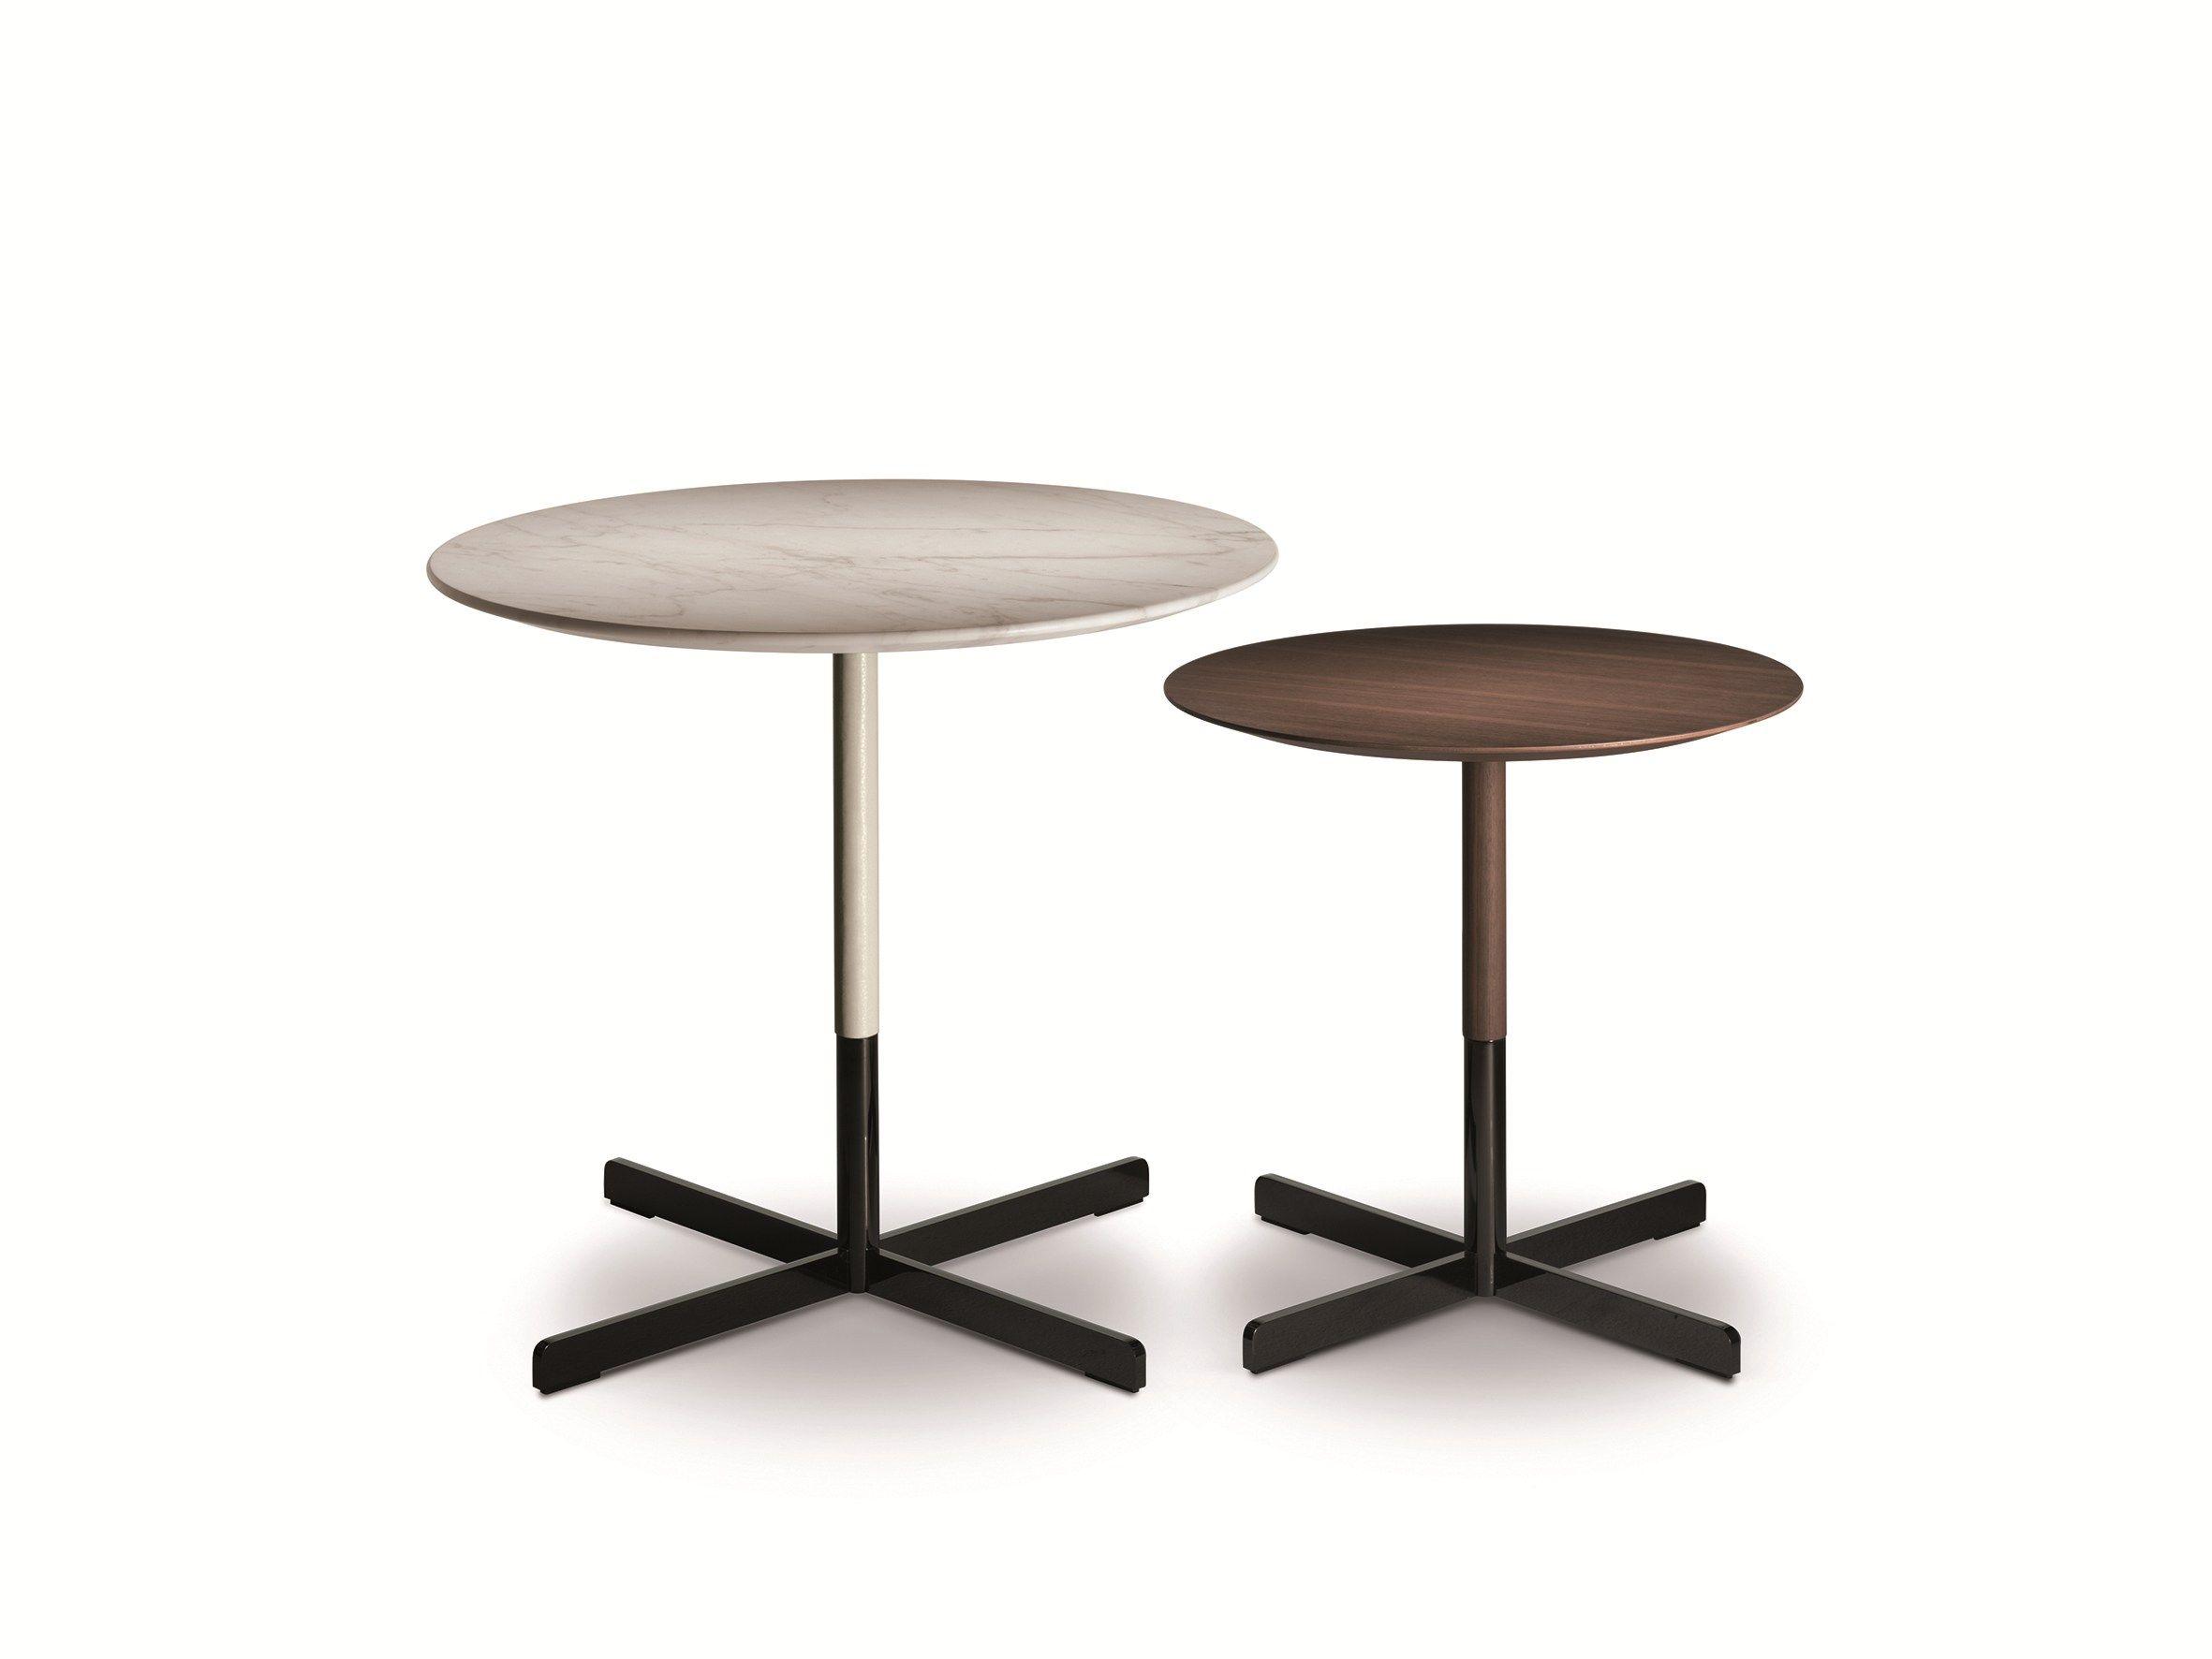 bob marble coffee table by poltrona frau design jean marie massaud